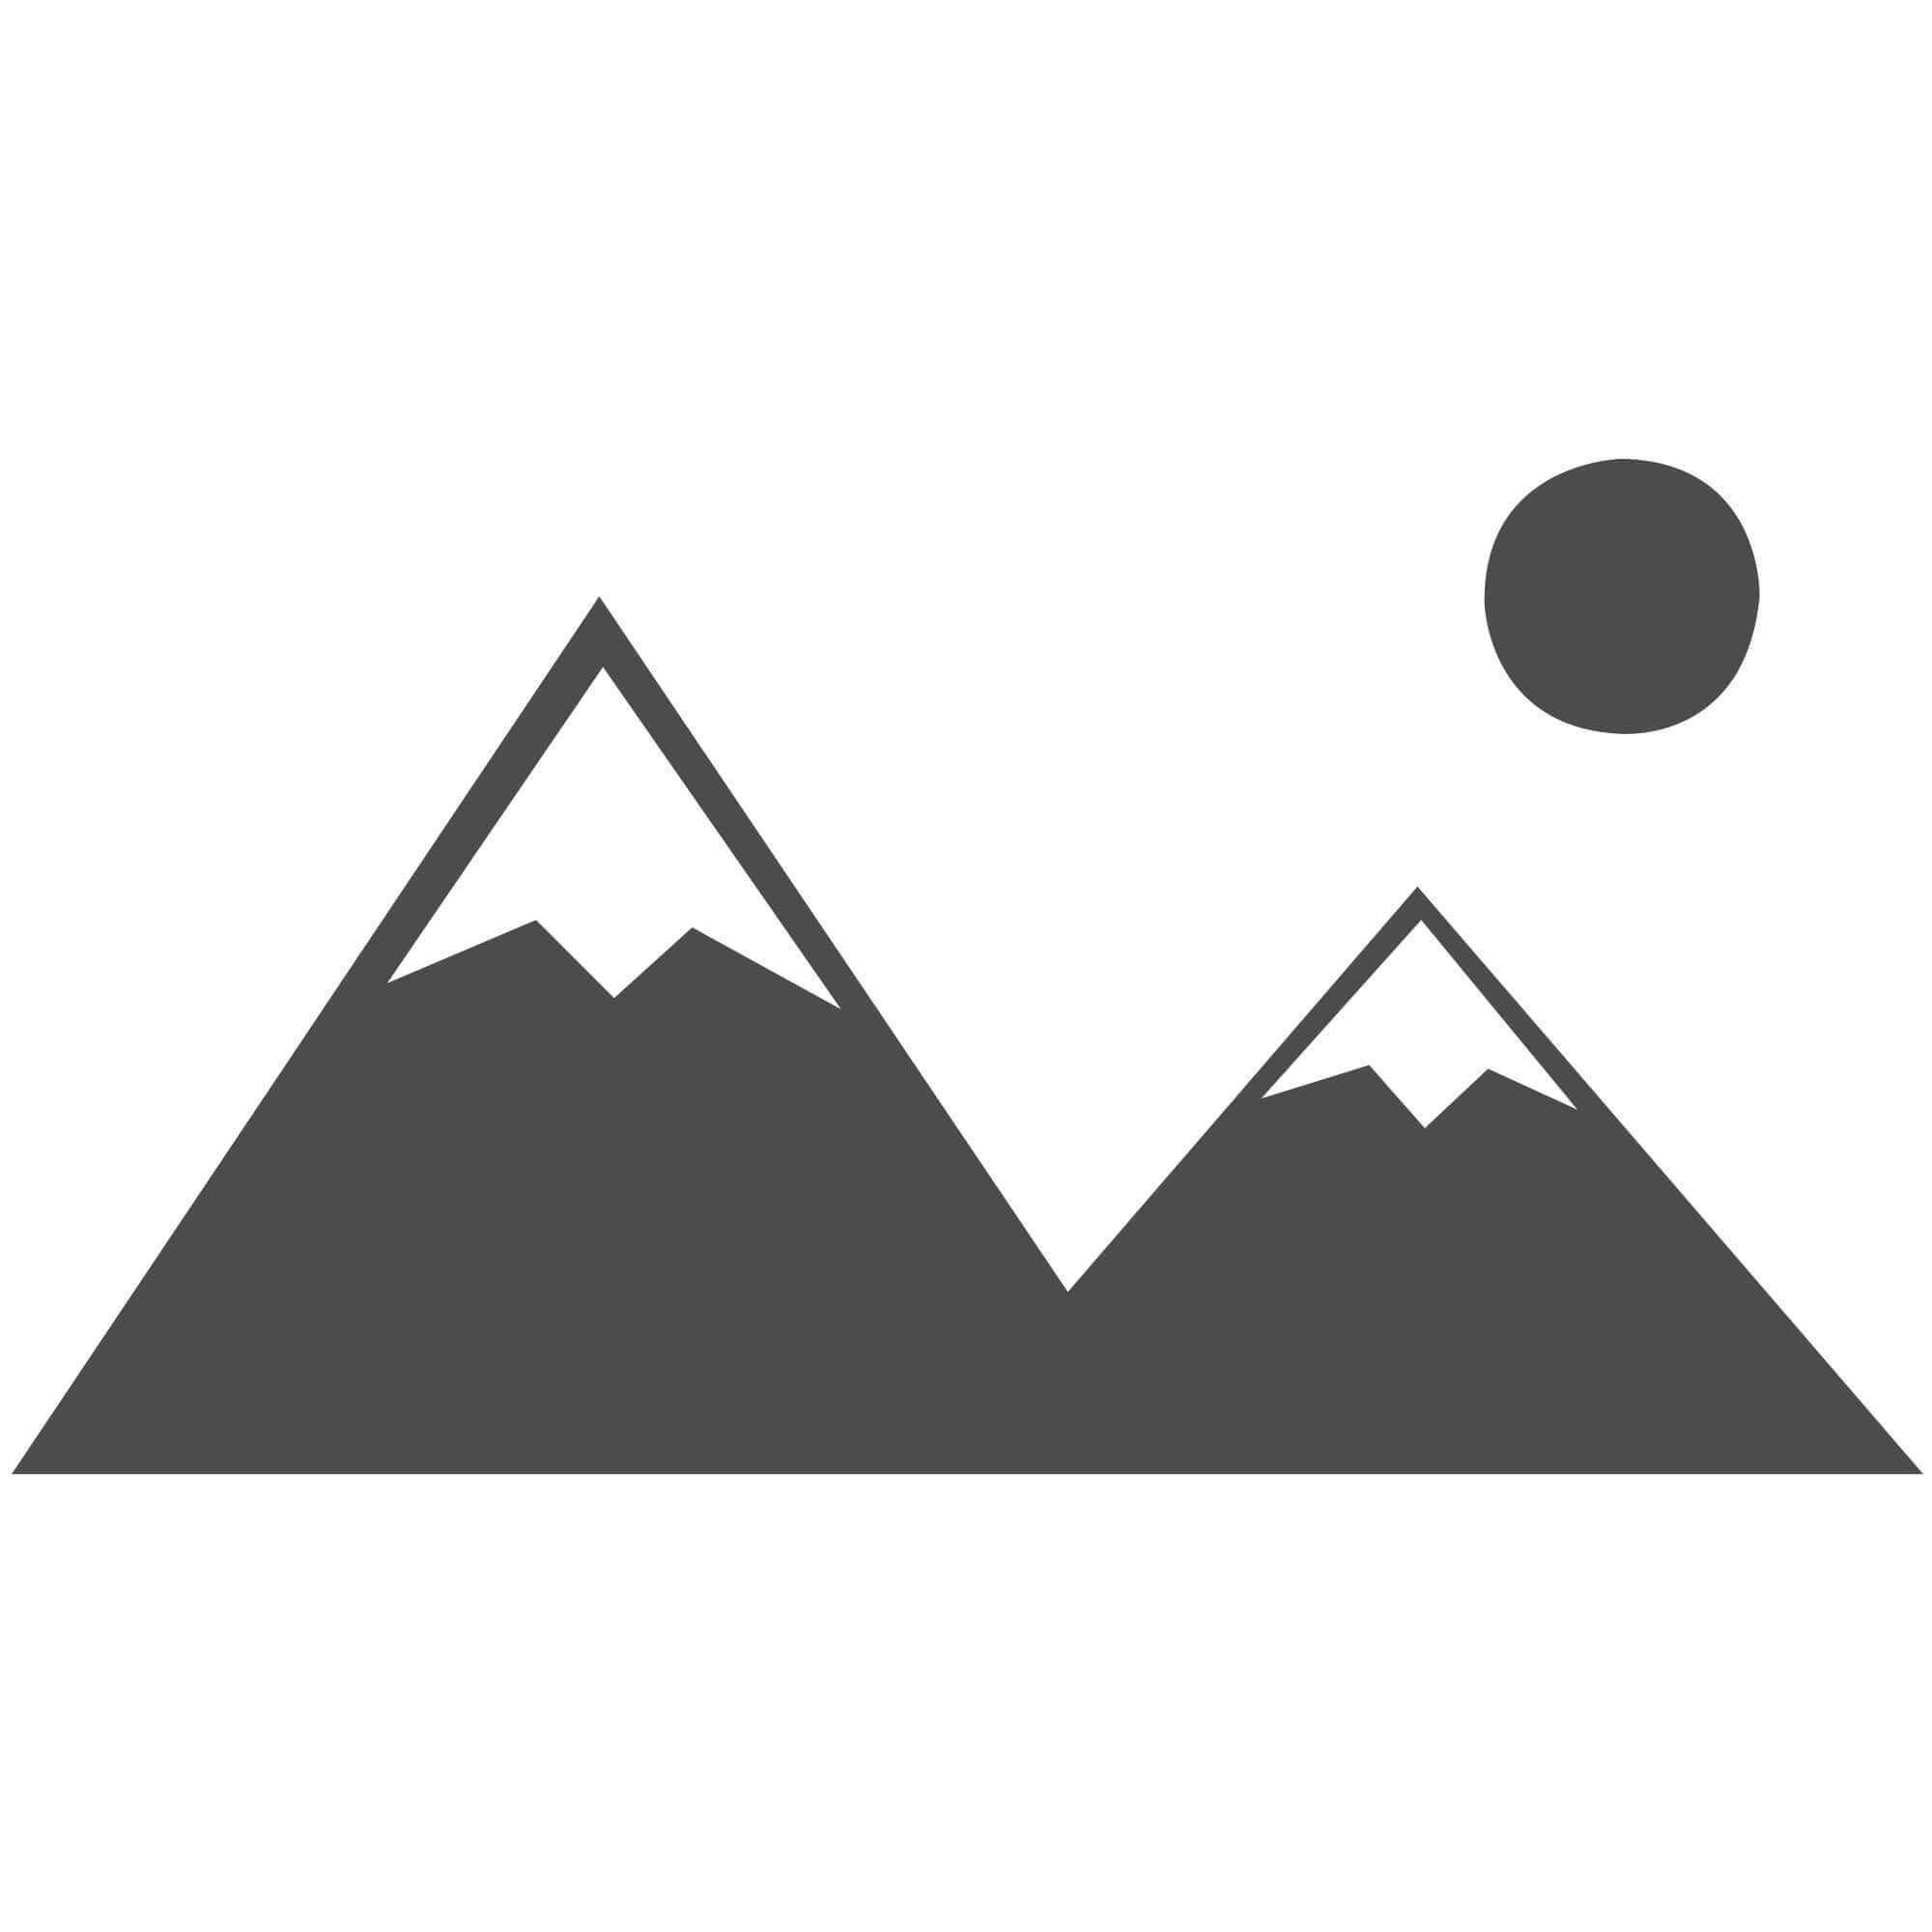 Hardinge Speed Lathes For Sale, New & Used | MachineSales.com